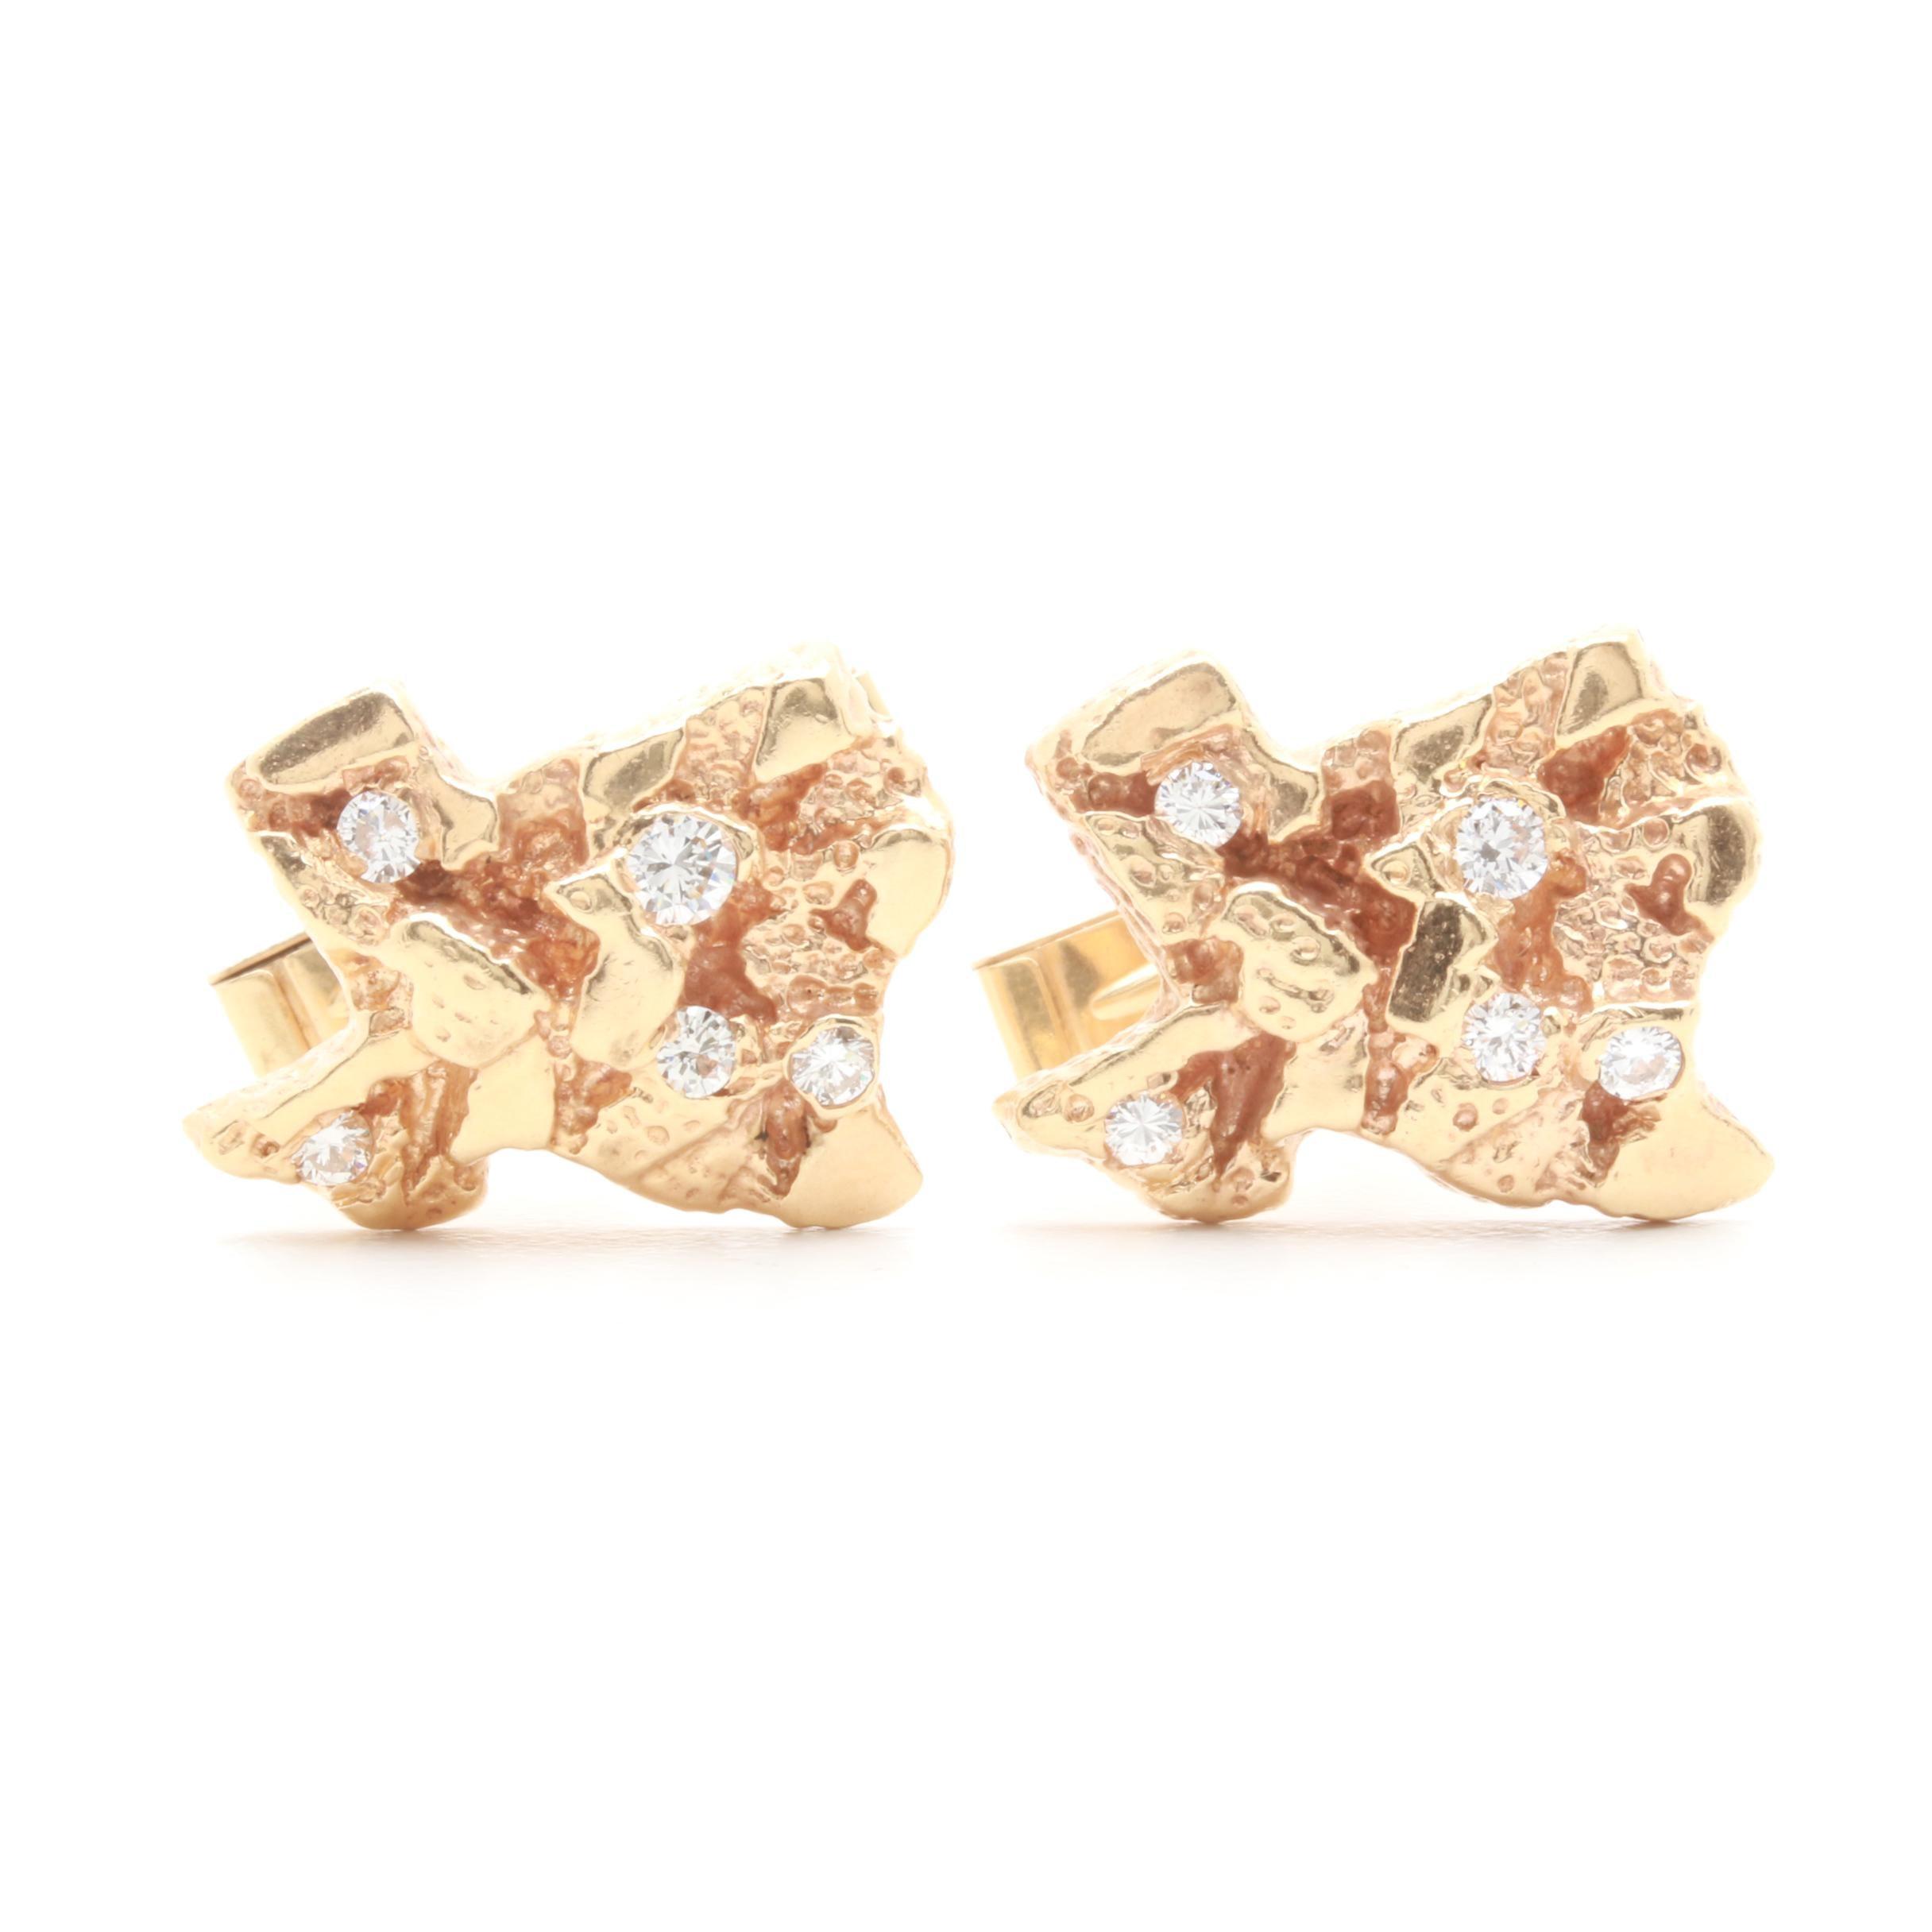 14K Yellow Gold Diamond State of Texas Cufflinks